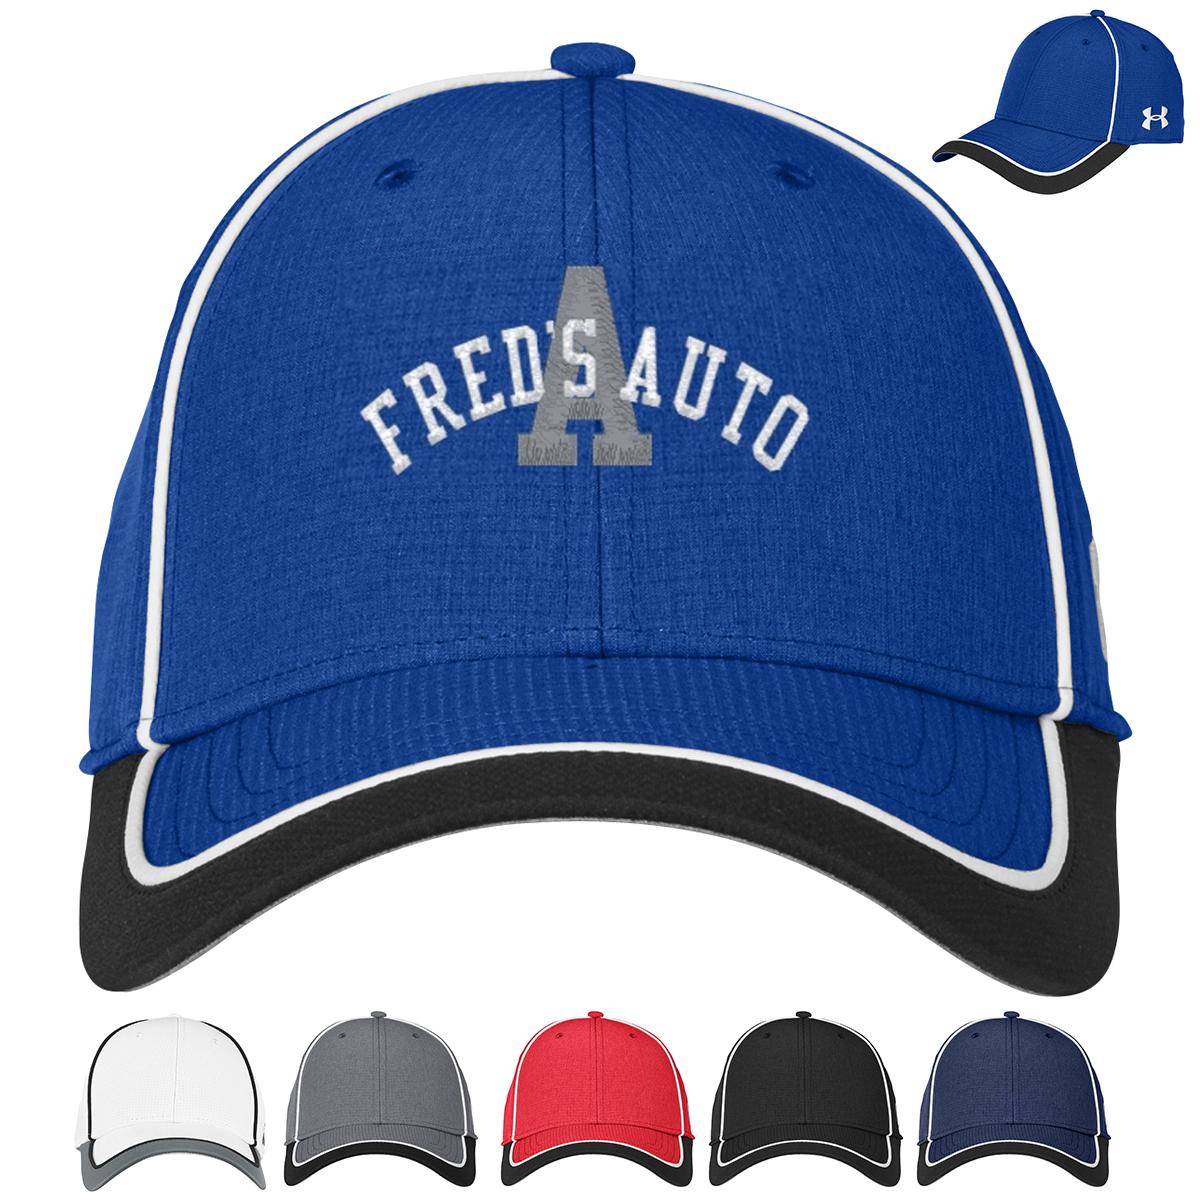 304e2f5a263 Promotional under armour sideline cap customized under armour jpg 1200x1200 Under  armour sideline hat